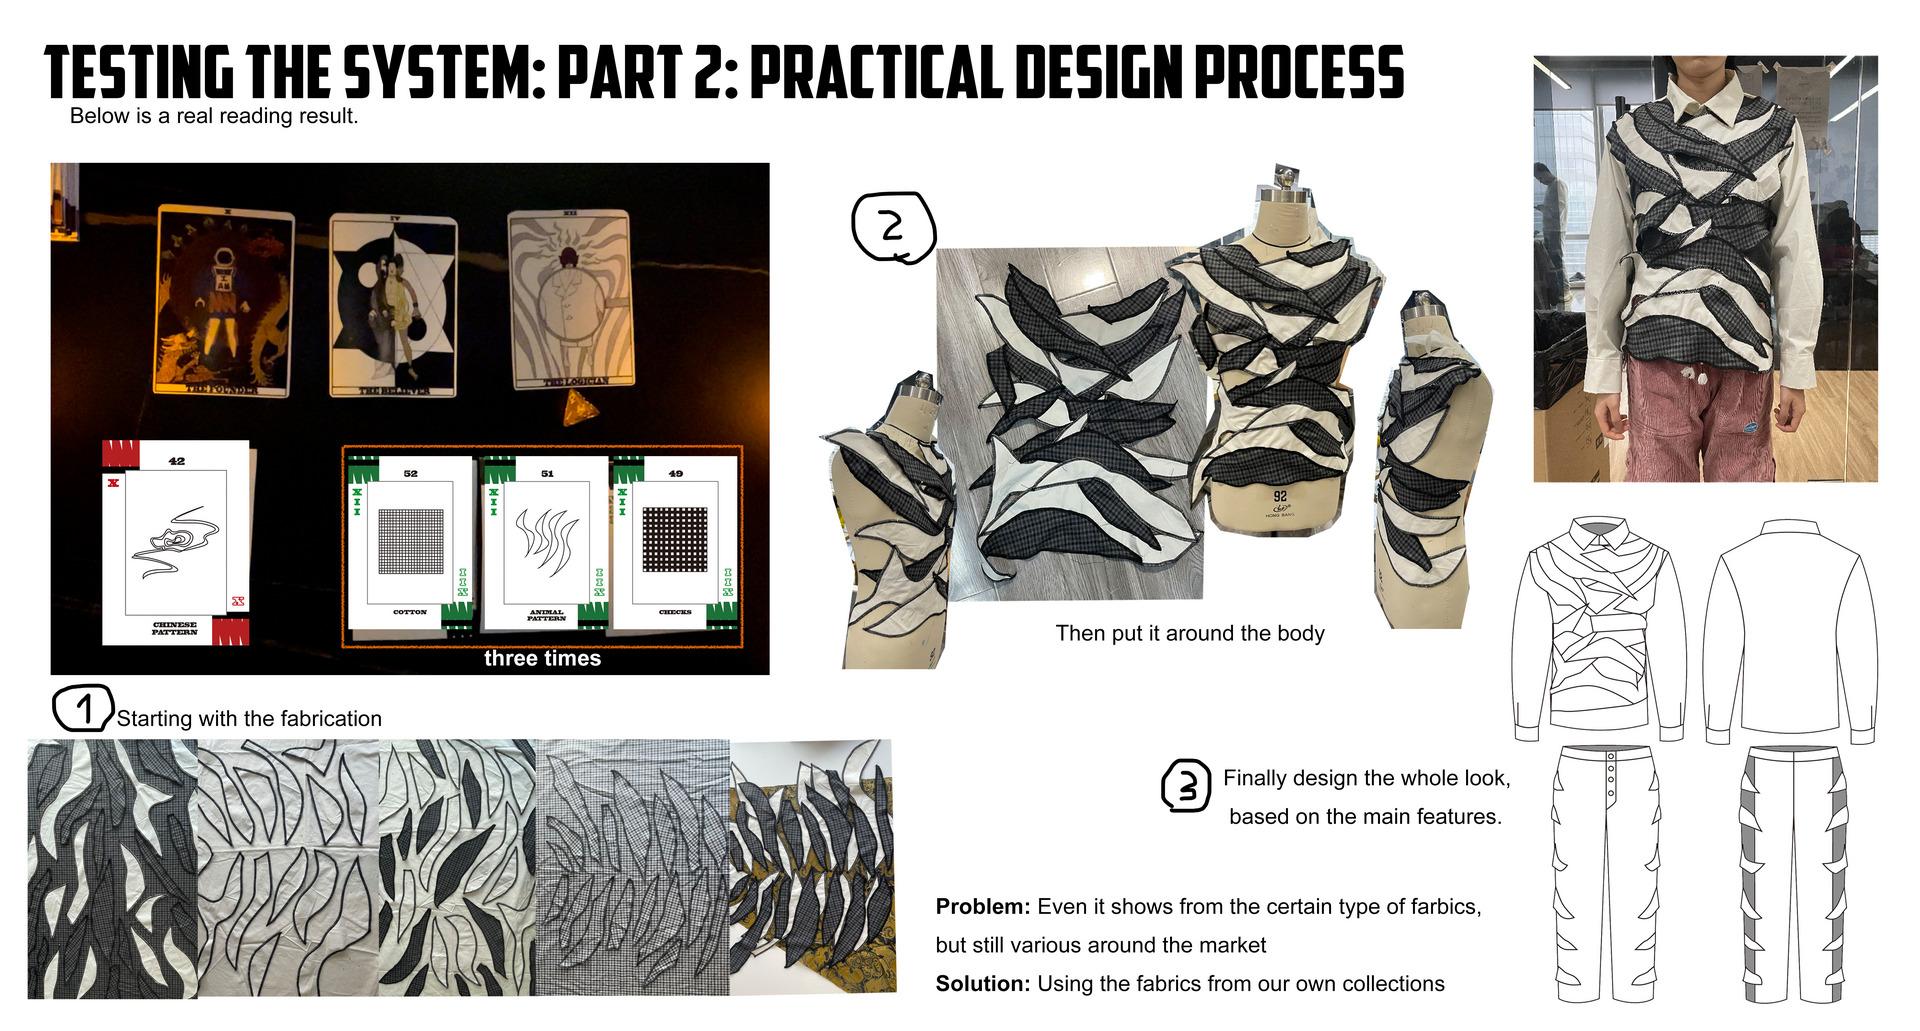 Practical Design Process Pt.1